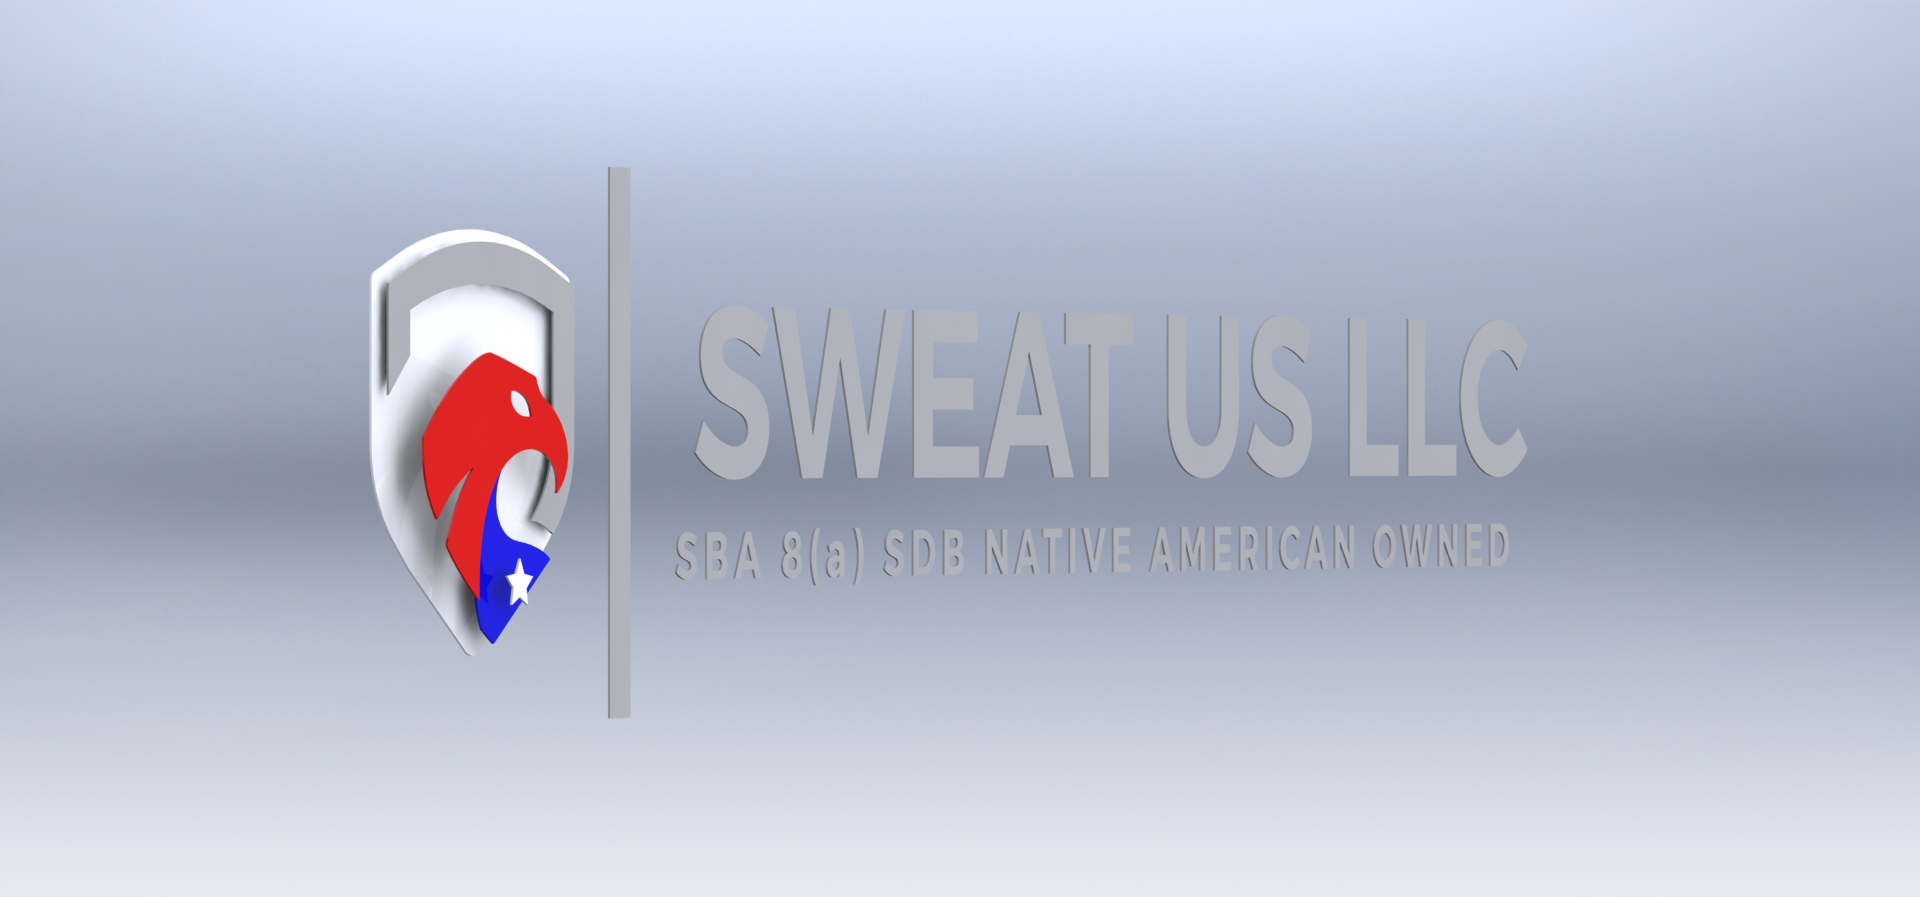 p2 - left - Sweat US LLC.JPG